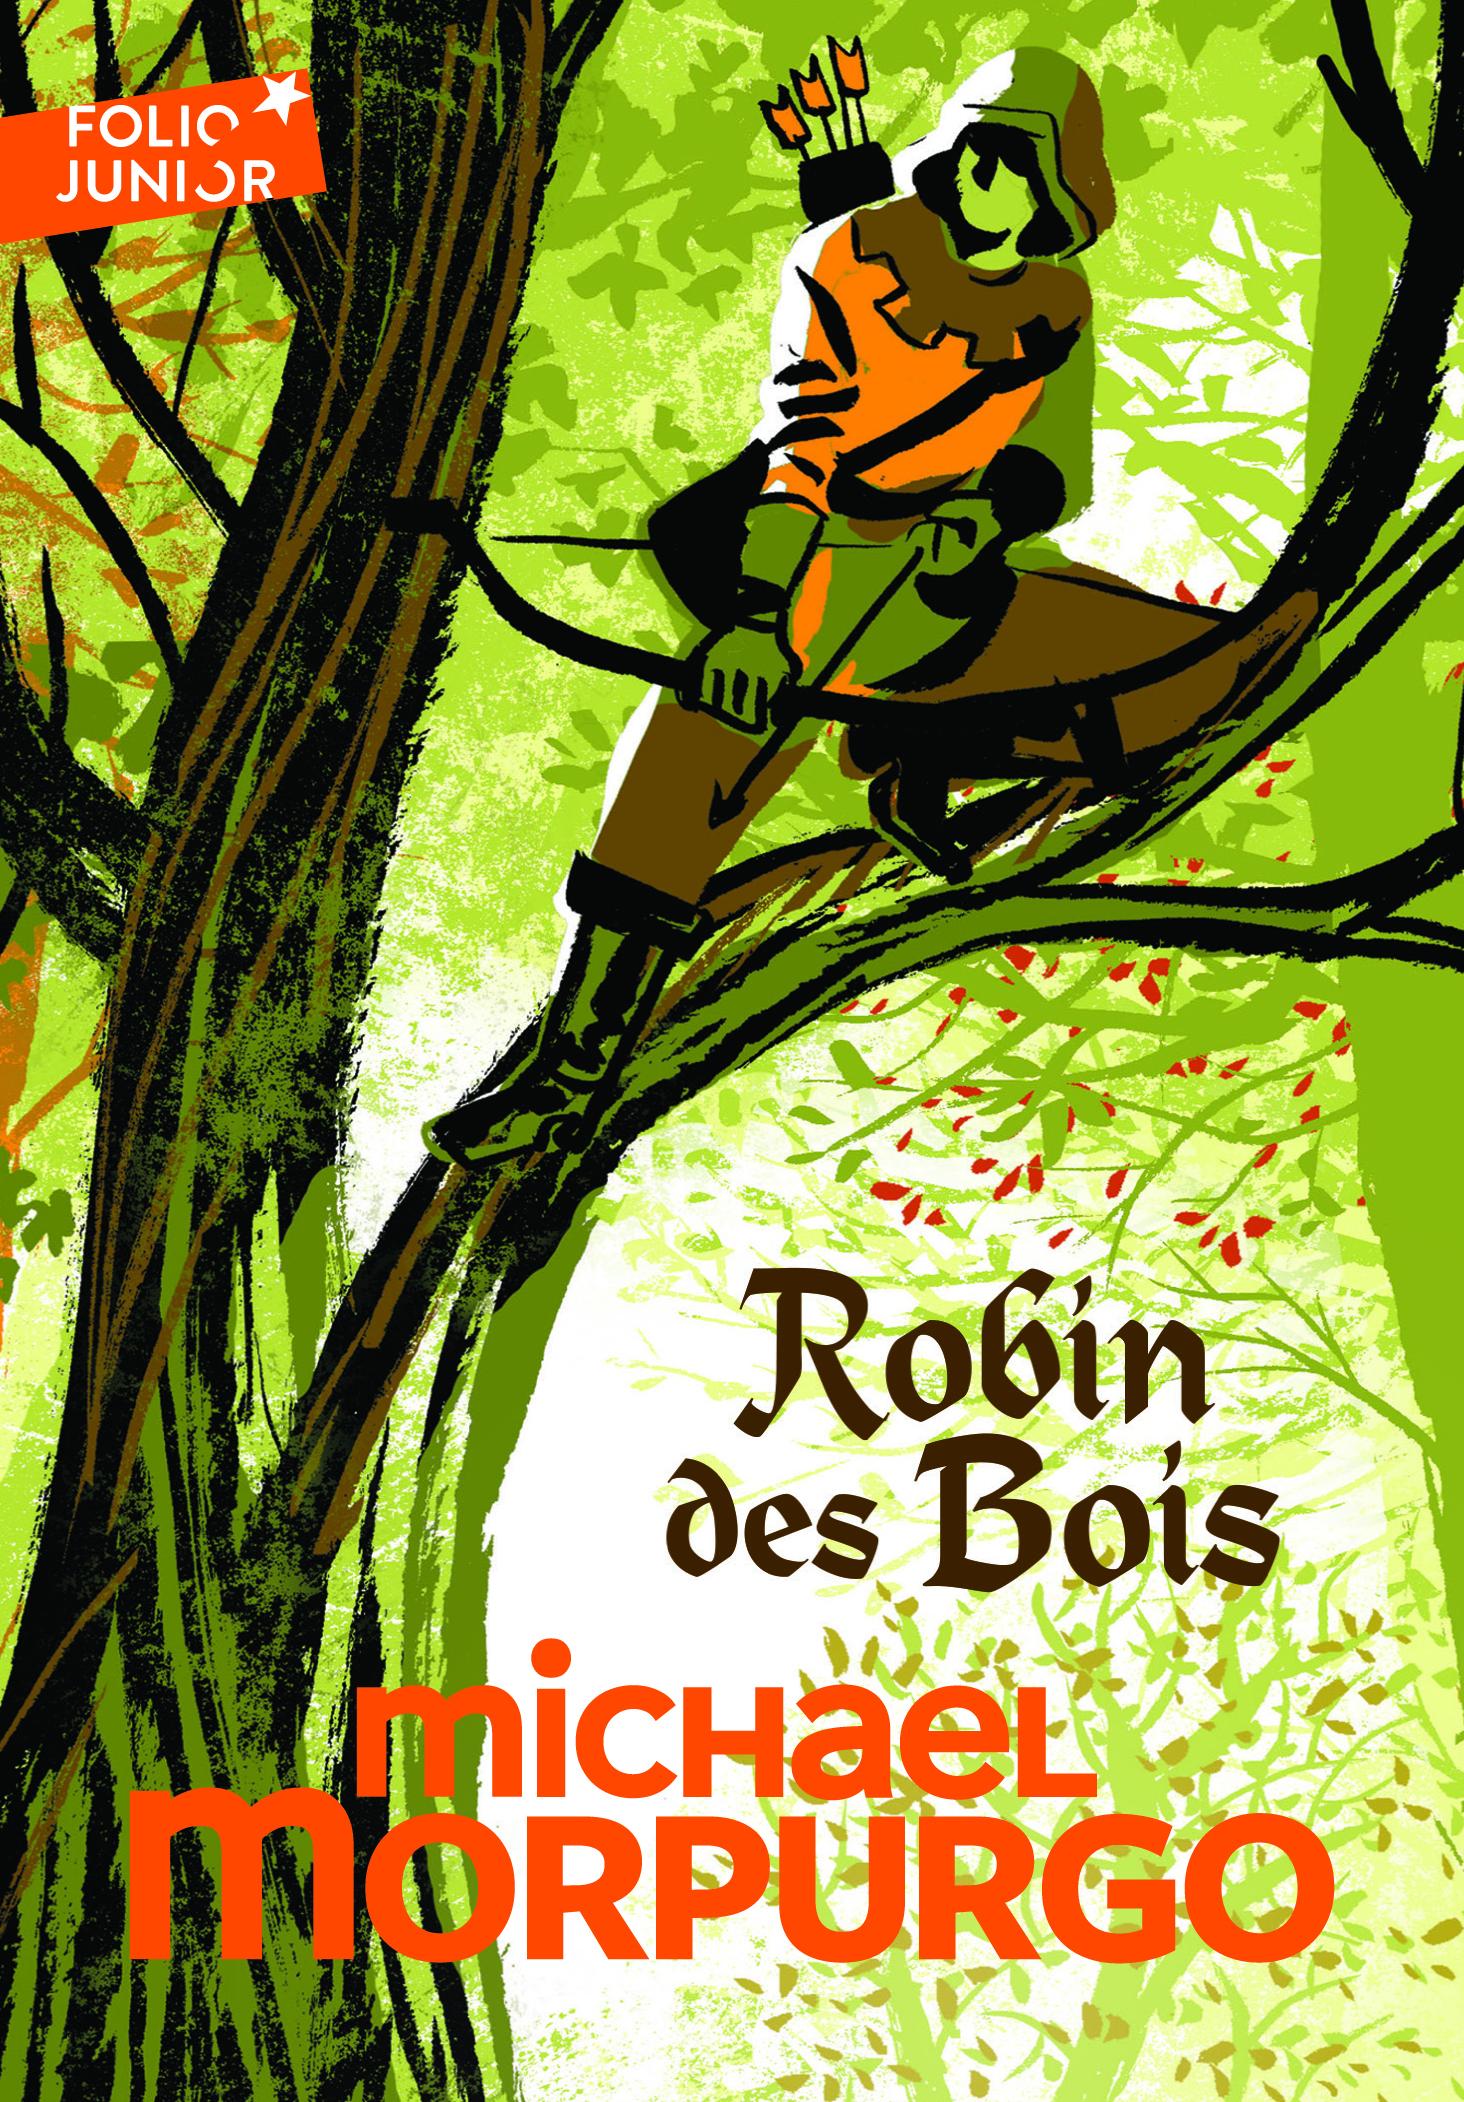 FOLIO JUNIOR - ROBIN DES BOIS